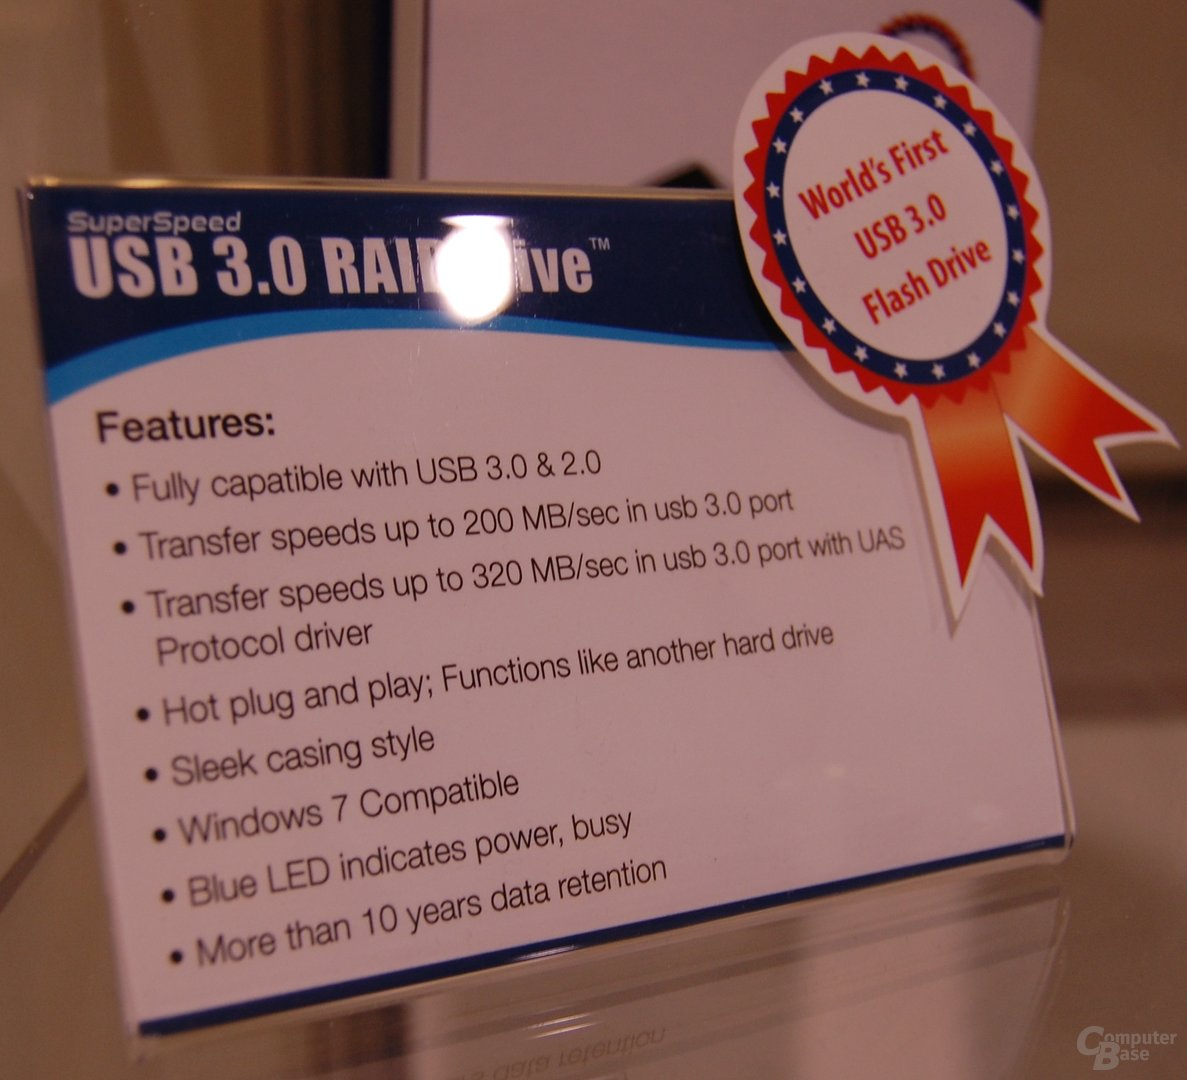 USB-3.0-Stick von Super Talent